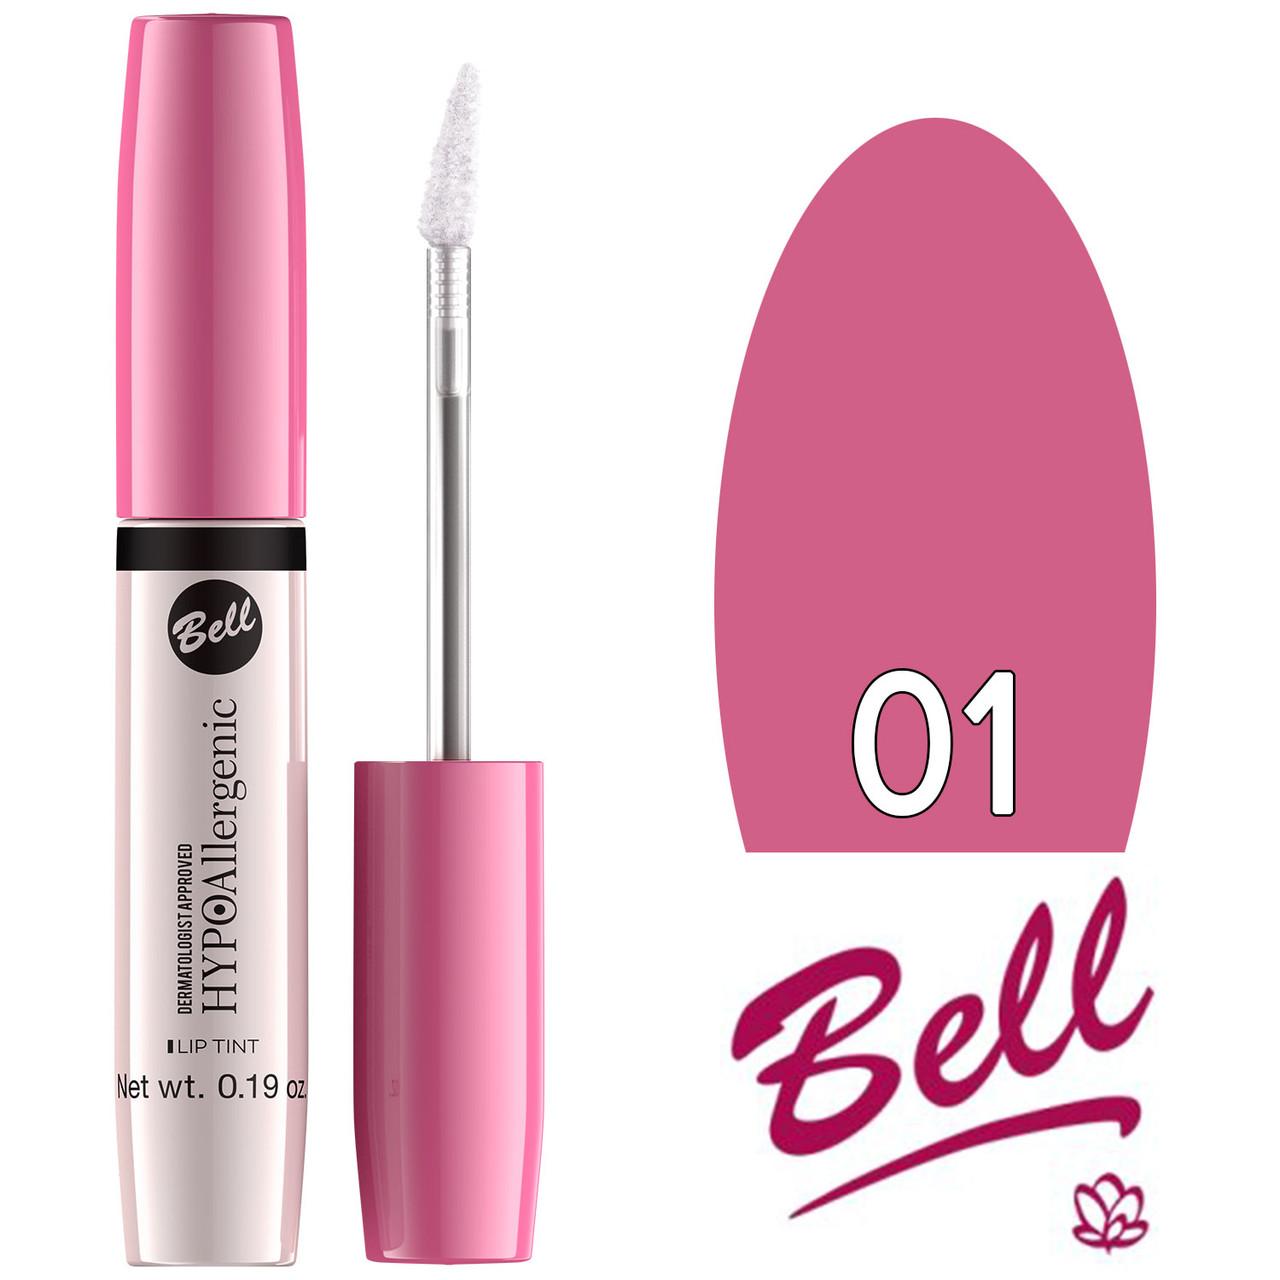 Bell HypoAllergenic - Блеск-краска для губ Lip Tint (гипоал.) Тон №01 light lilac глянцевый